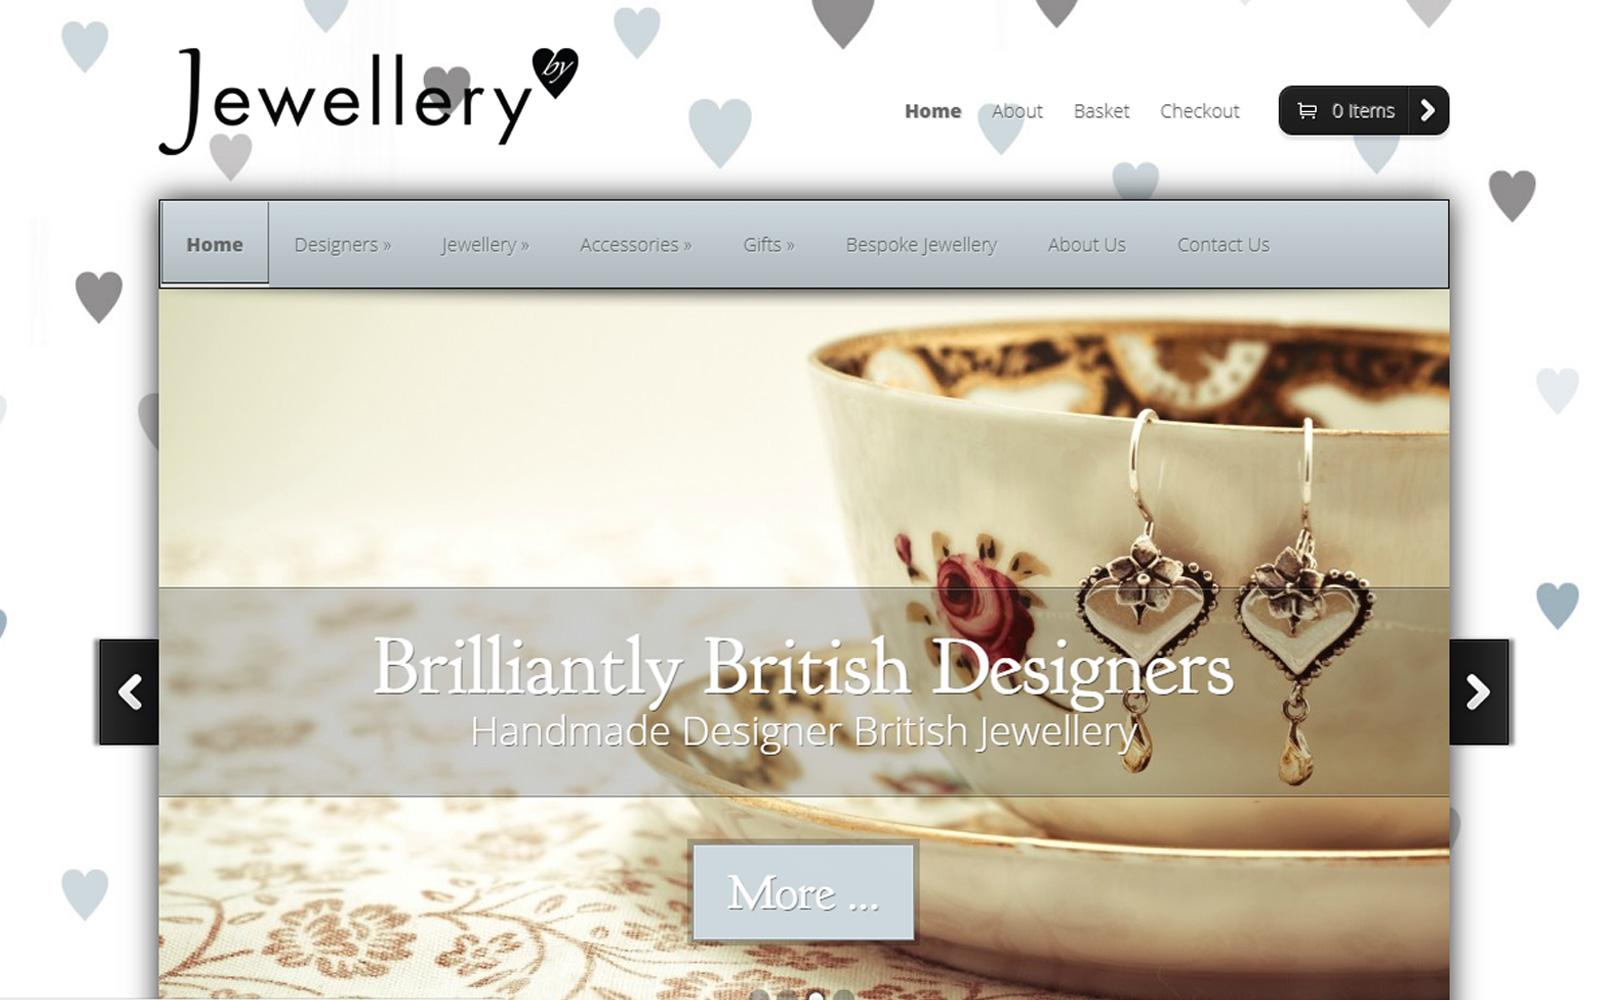 Jewellery by E Commerce Development